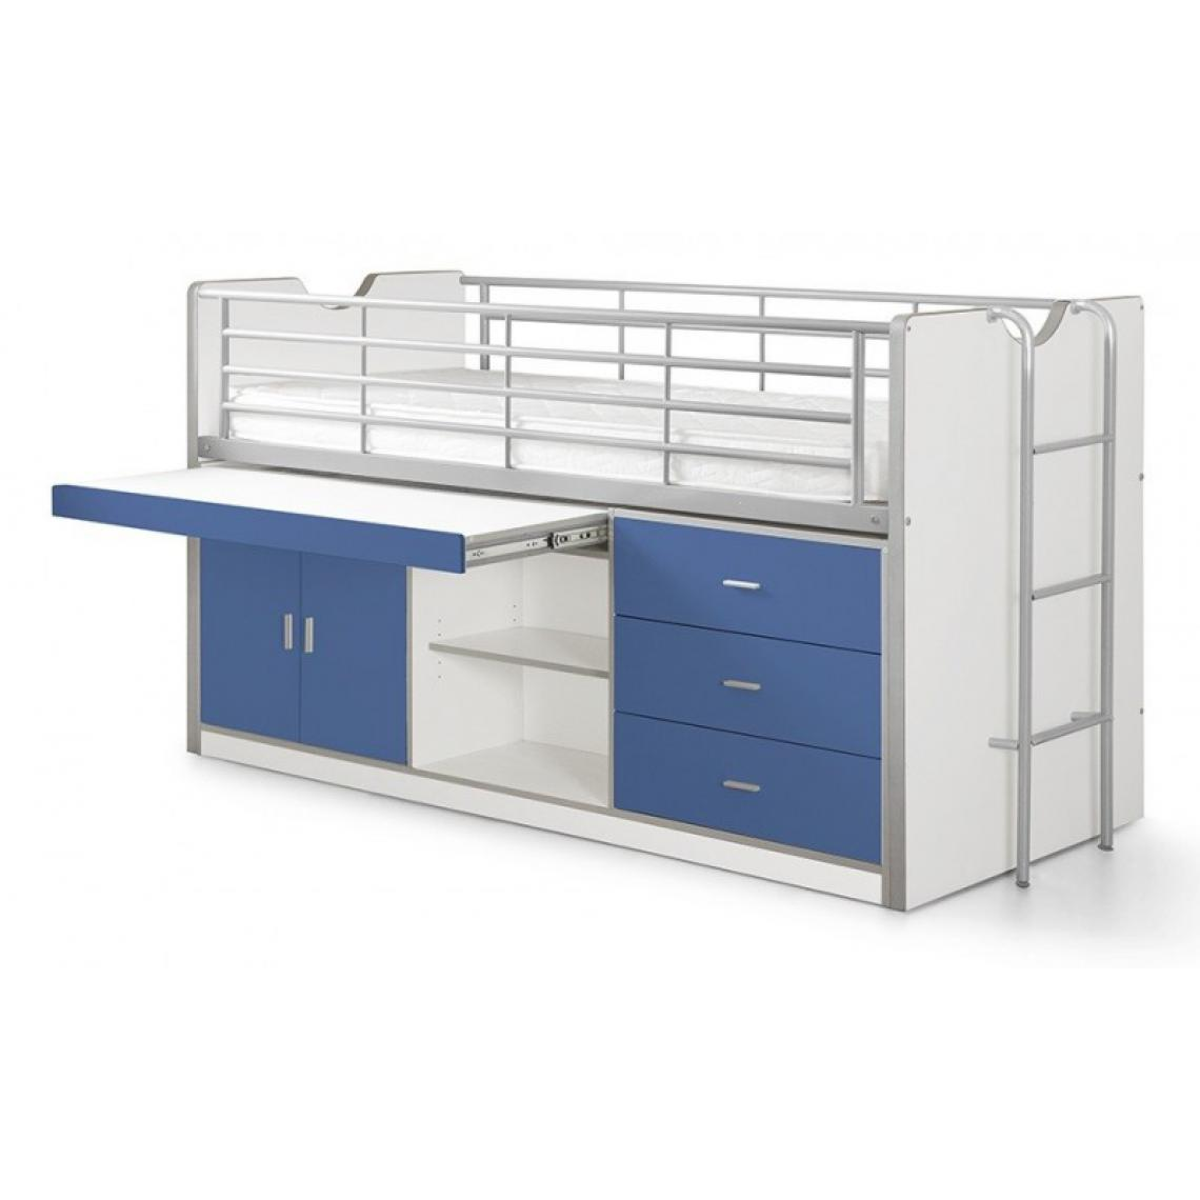 Vipack Vipack Lit Combiné Bureau Bonny Bleu